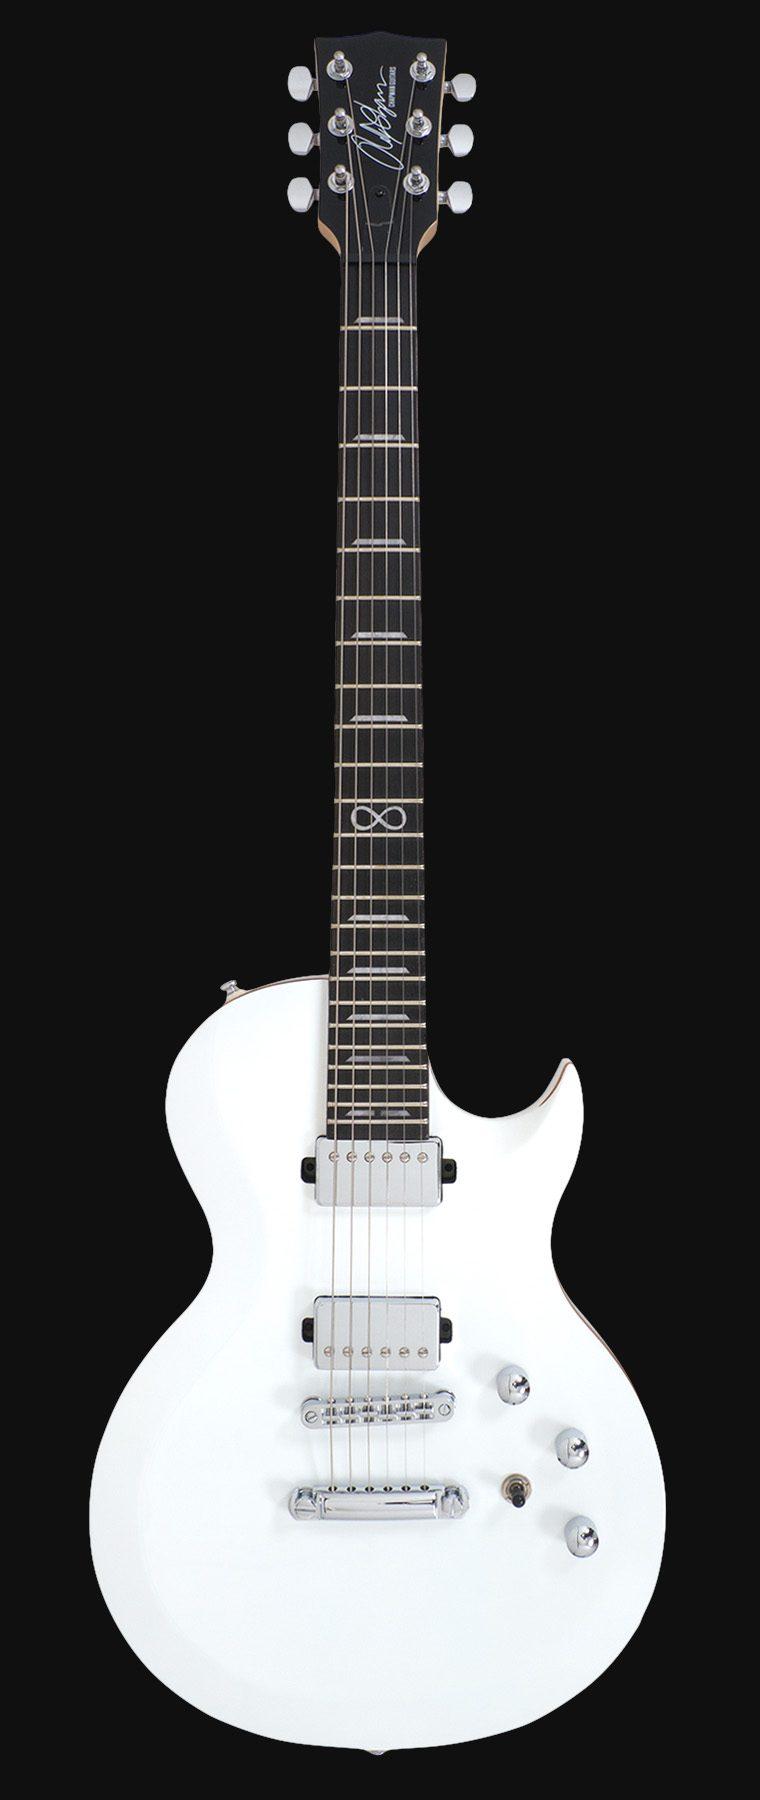 ml2 mod guitar